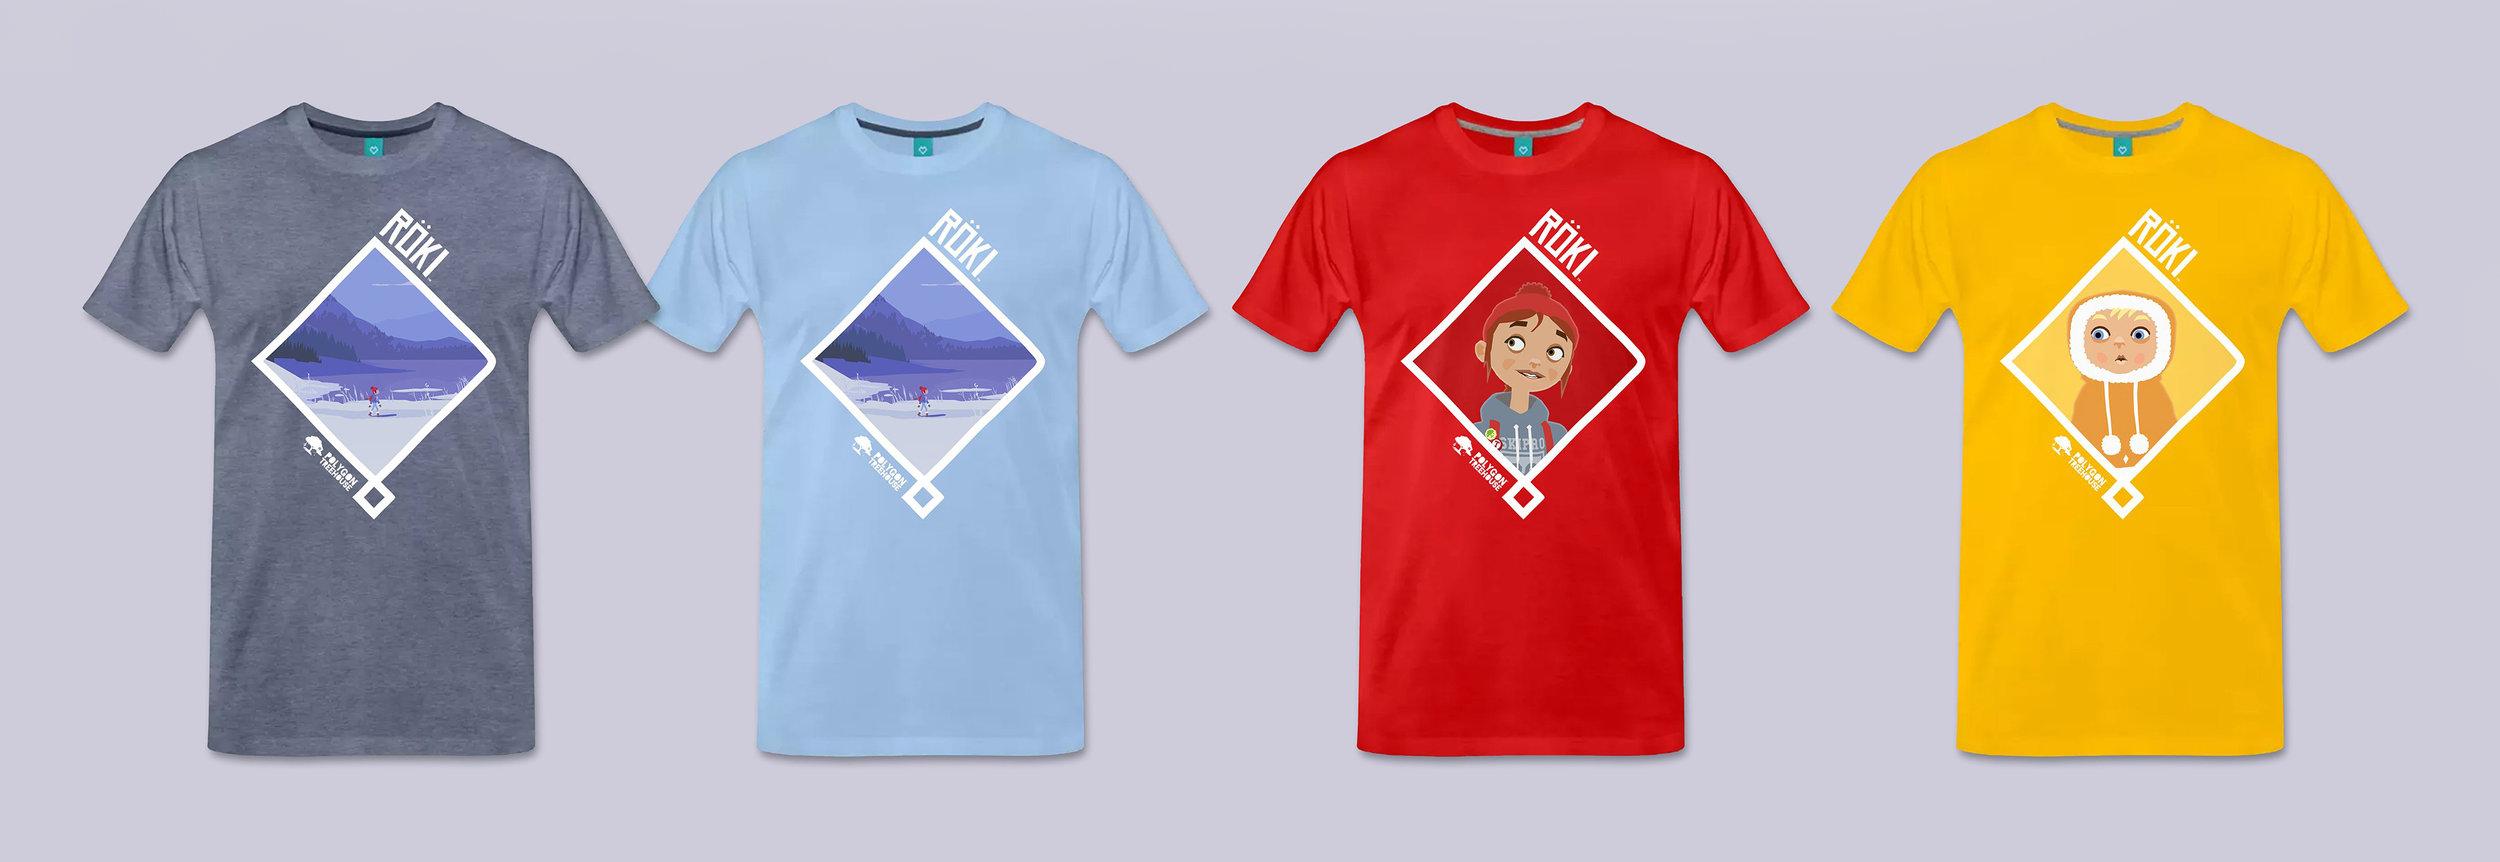 shirts.jpg